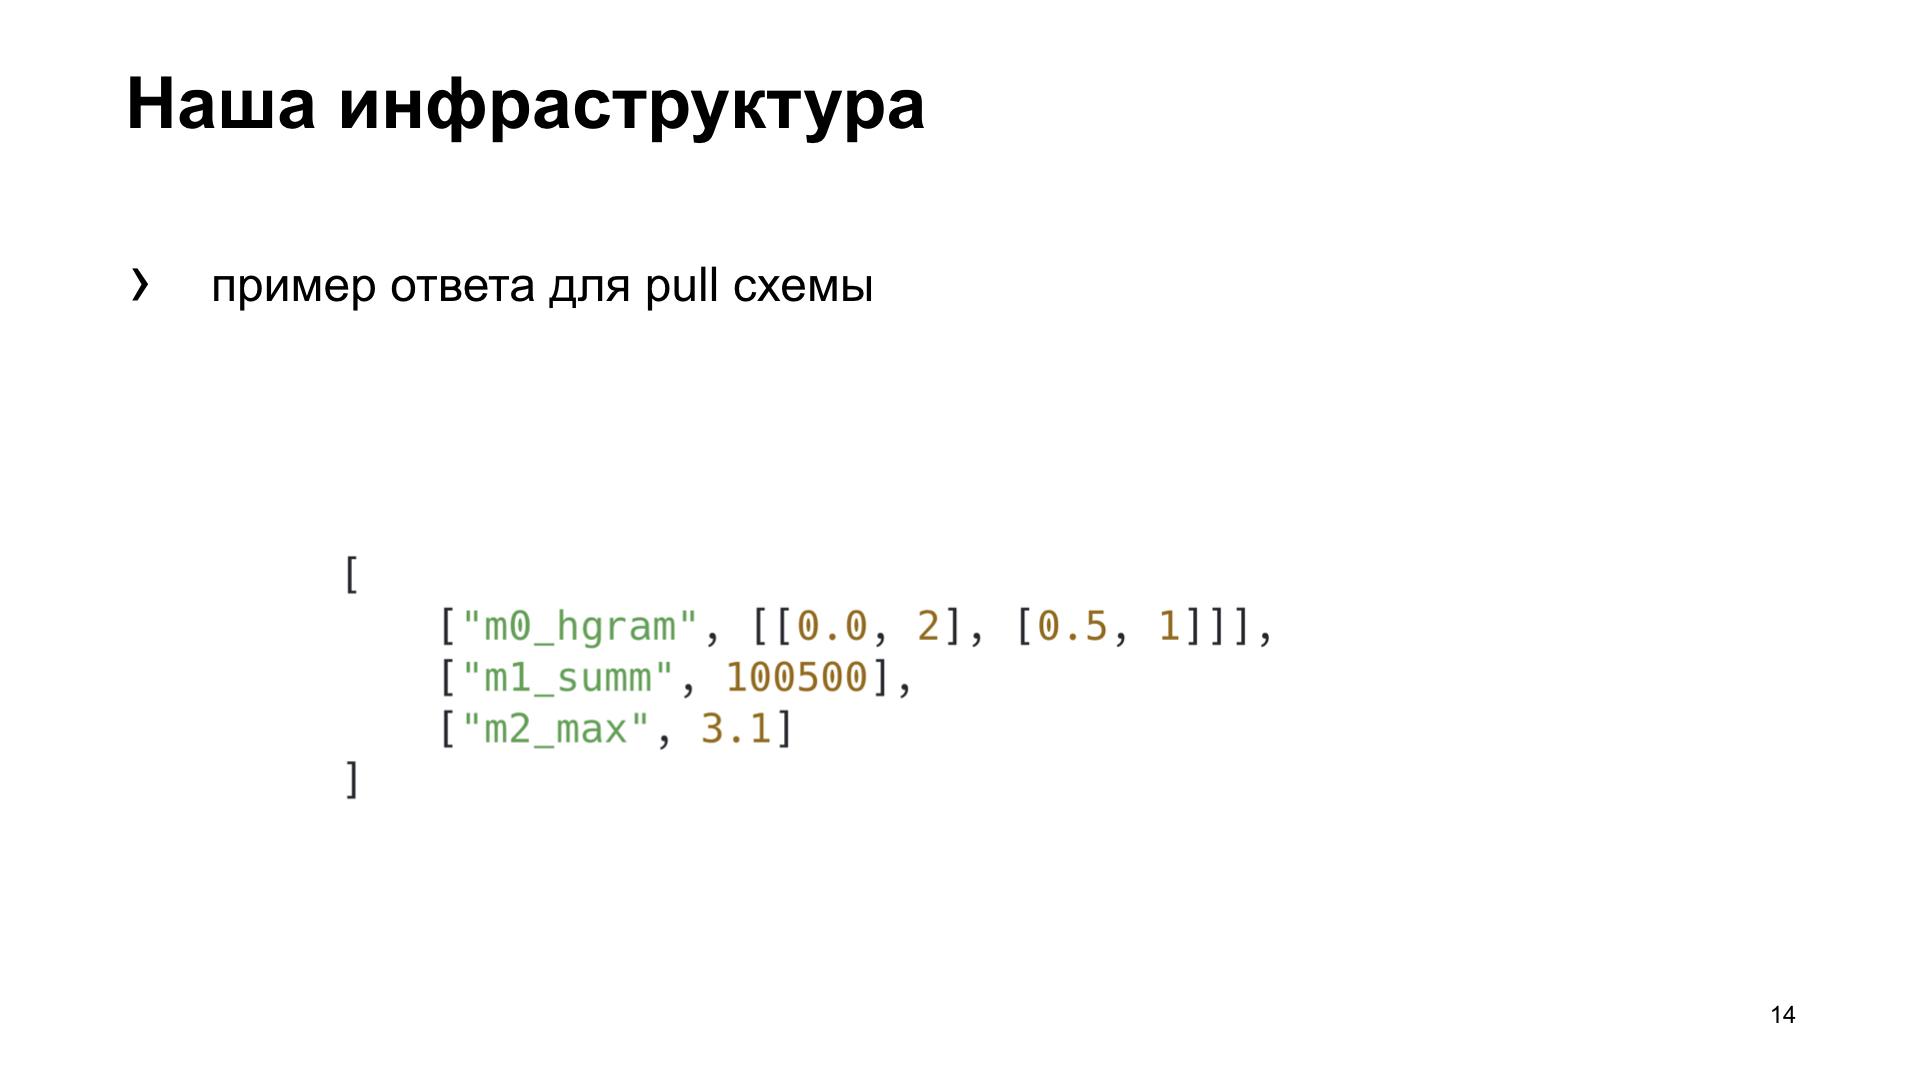 uWSGI в помощь метрикам. Доклад Яндекса - 9